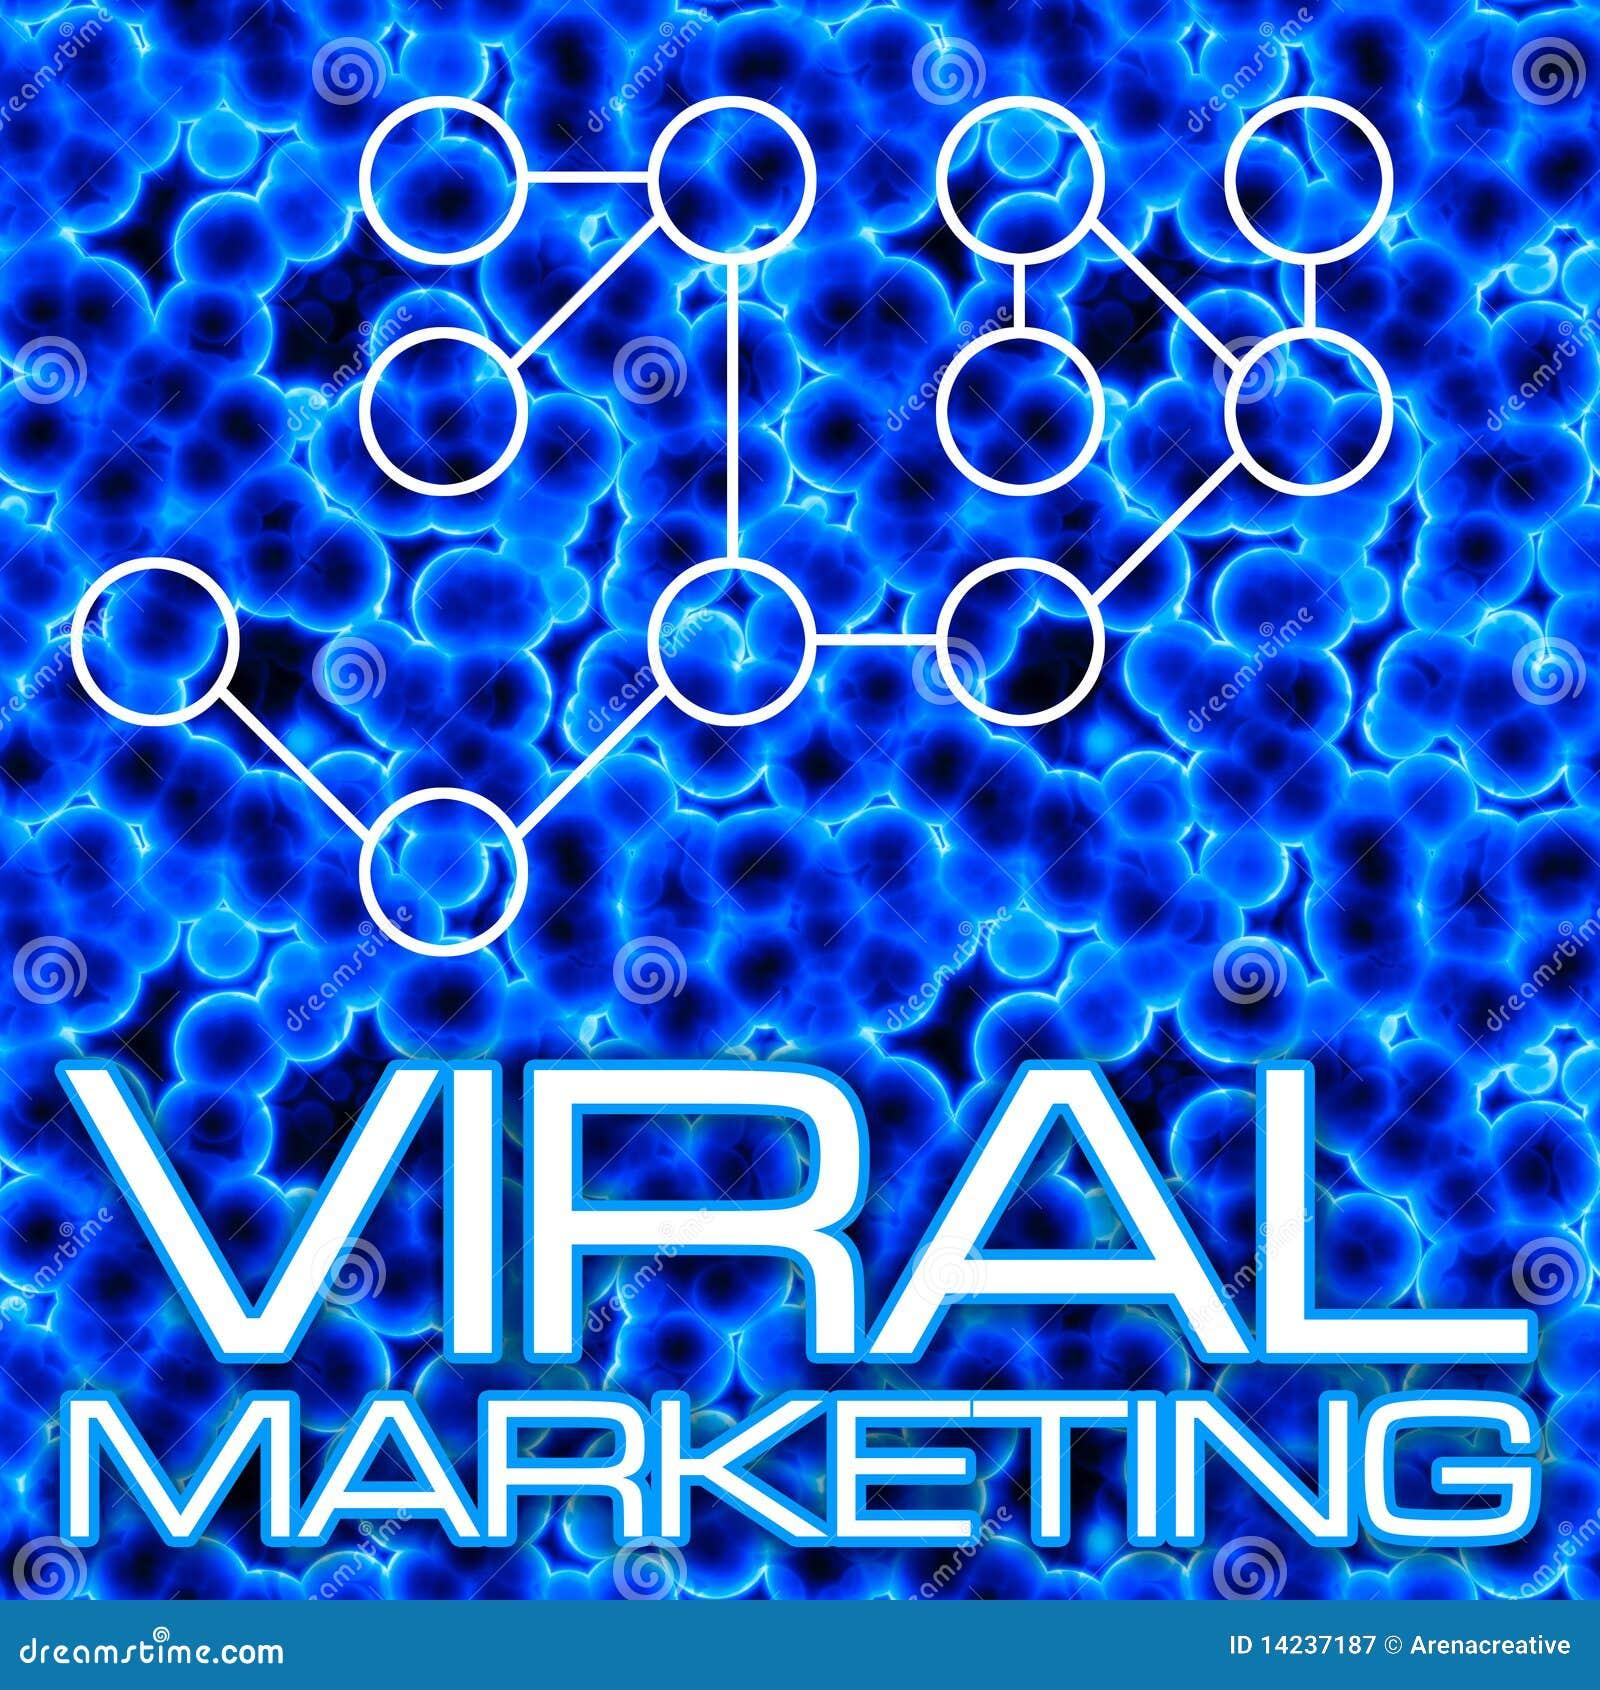 Viral Times Web: Viral Marketing Diagram Royalty Free Stock Photography